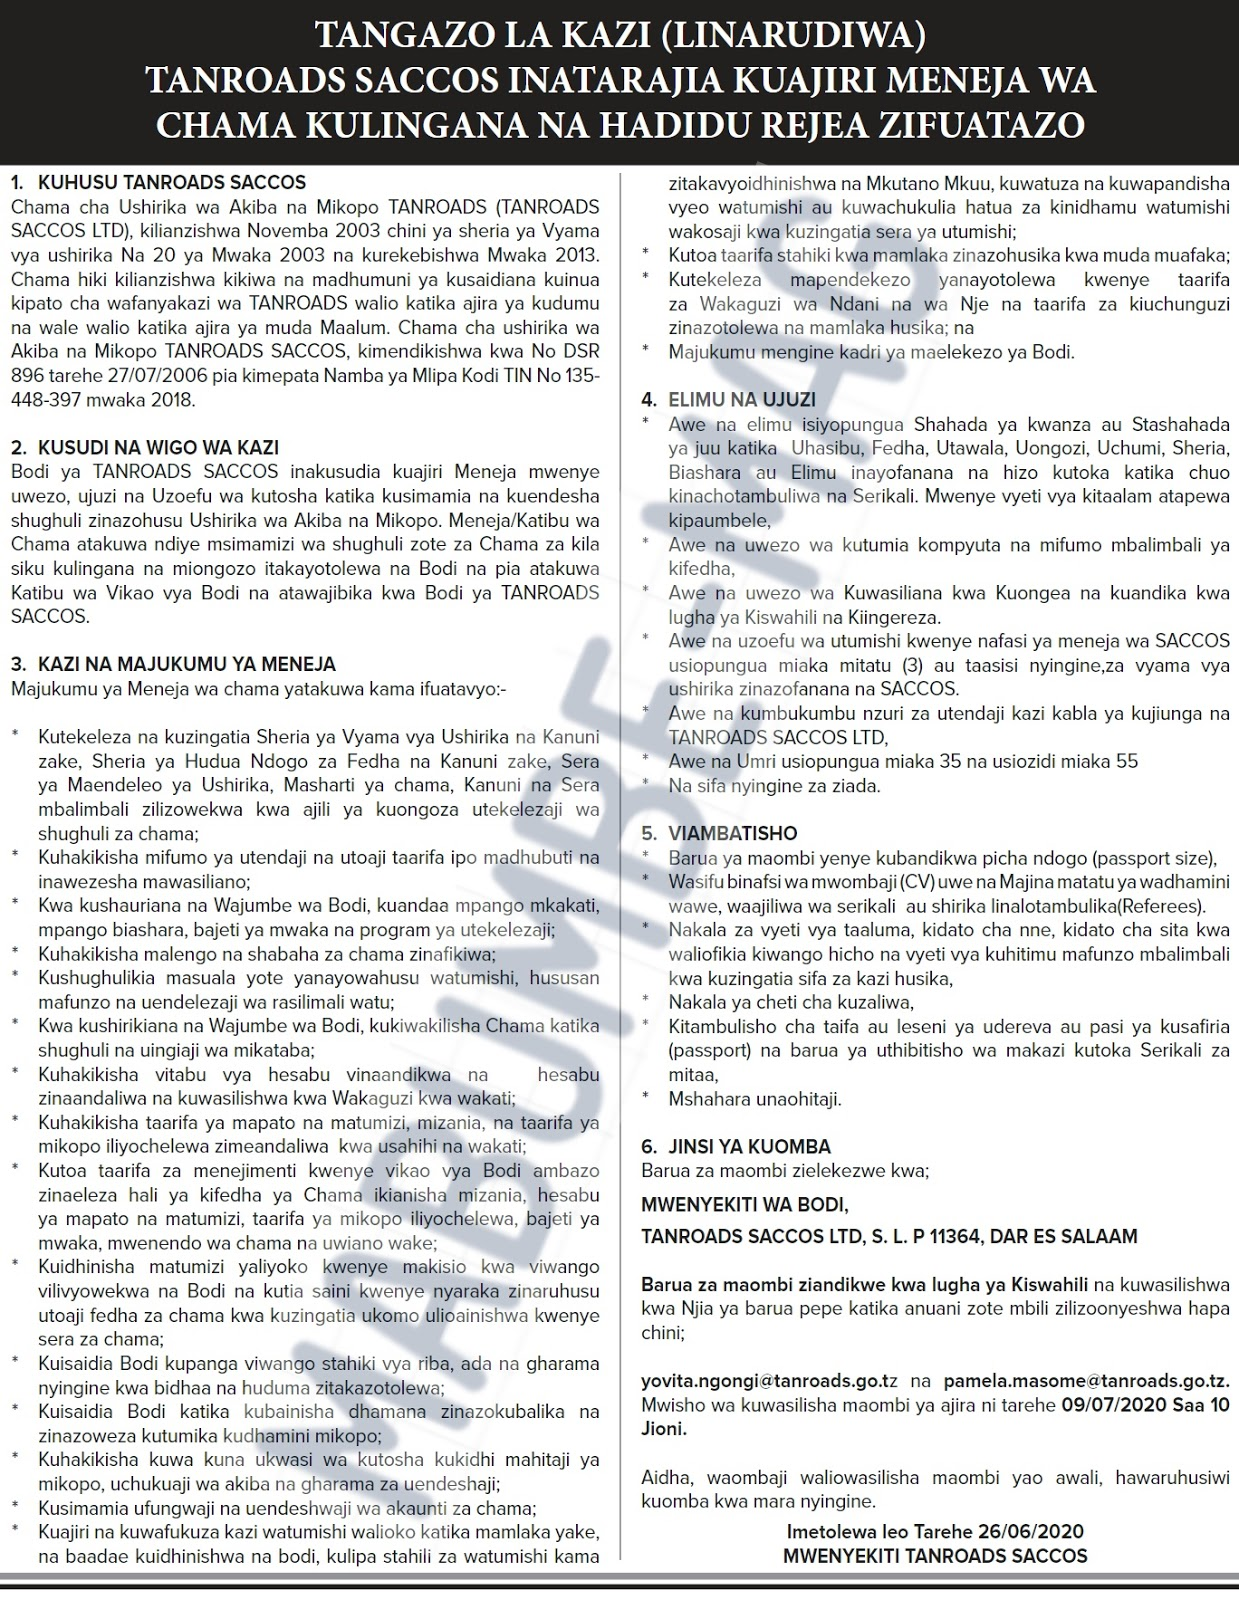 TANROADS SACCOS Jobs June 2020